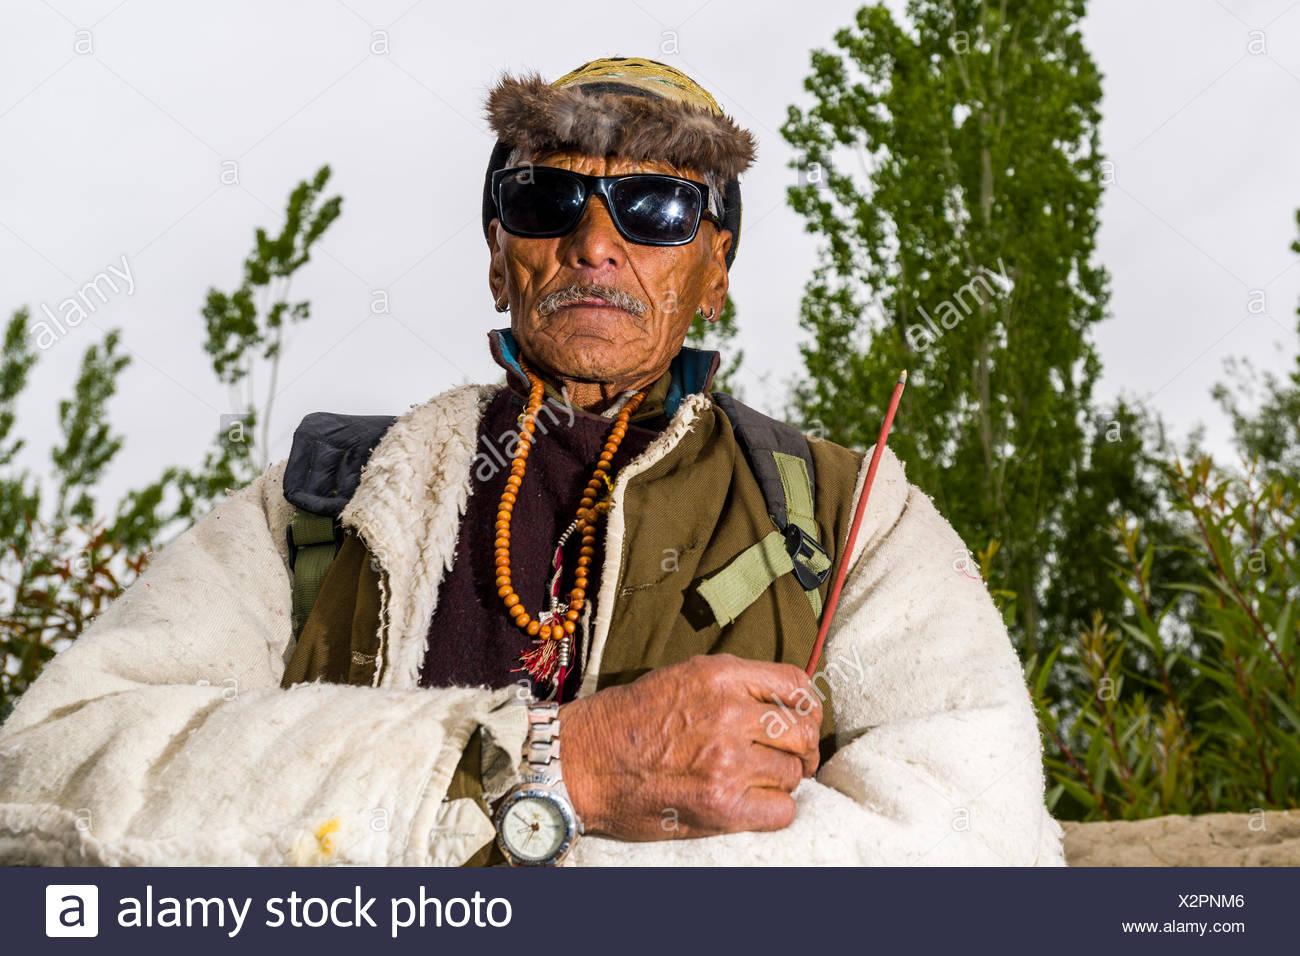 India Man Portrait Farmer Stock Photos & India Man ...